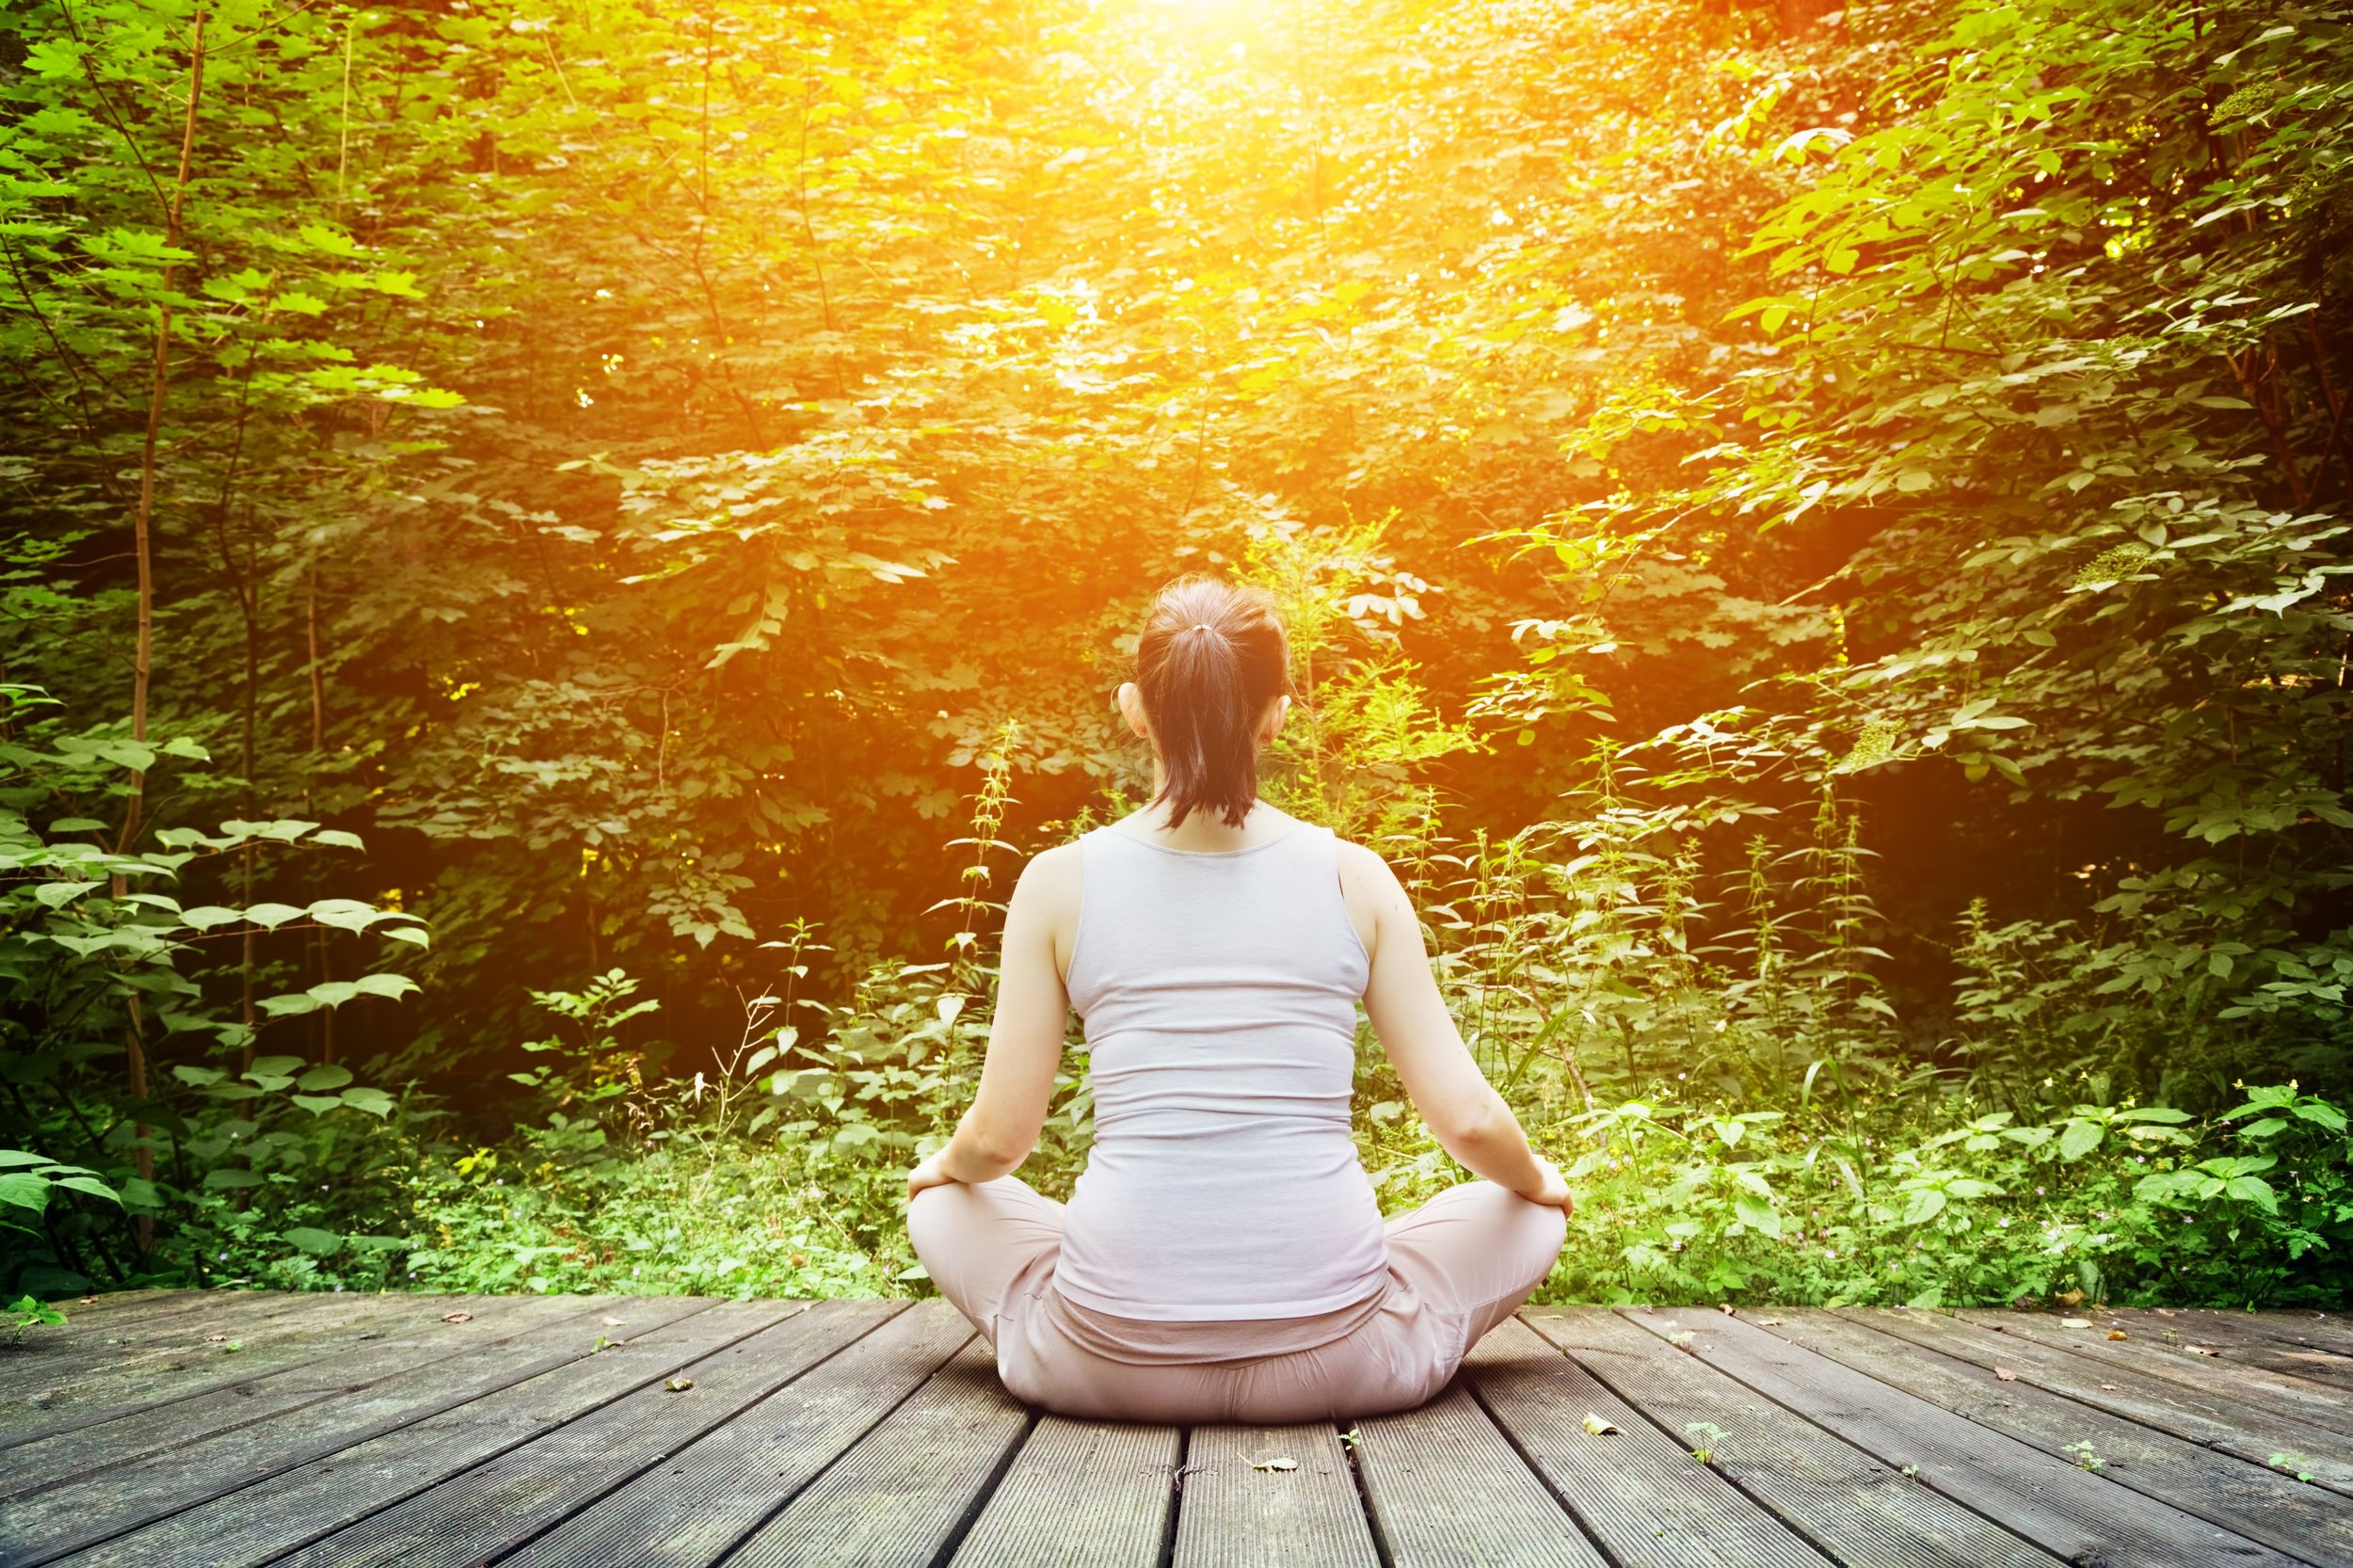 woman-sitting-on-deck-facing-woods.jpg